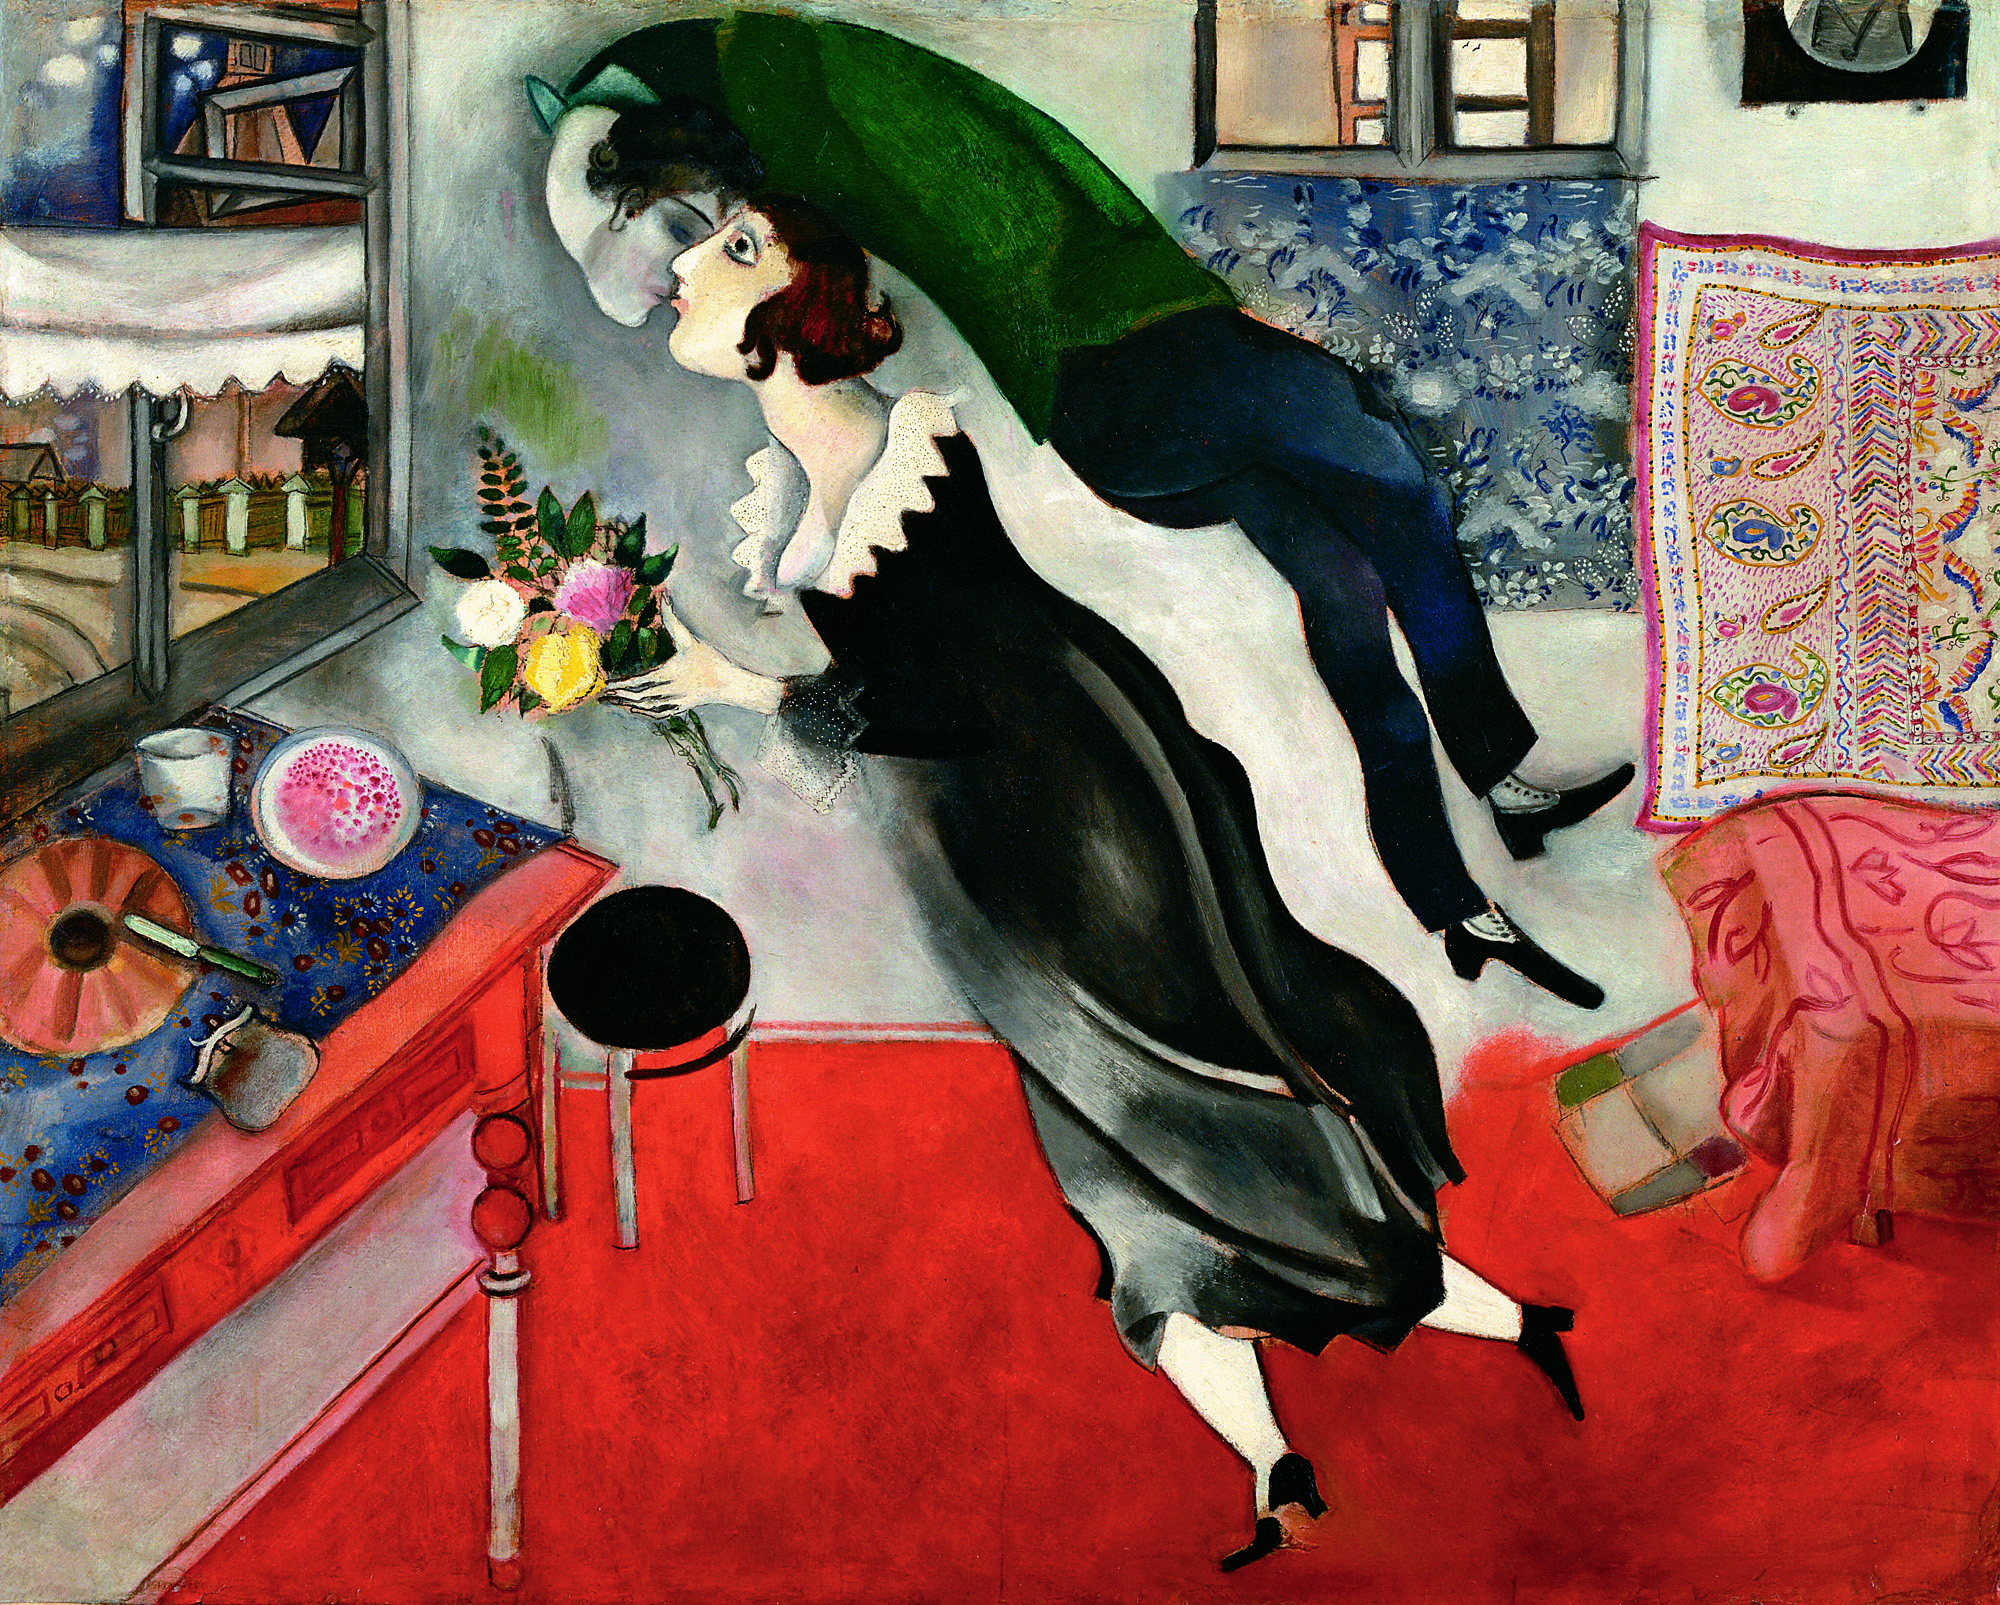 Marc Chagall, Il compleanno, 1915.